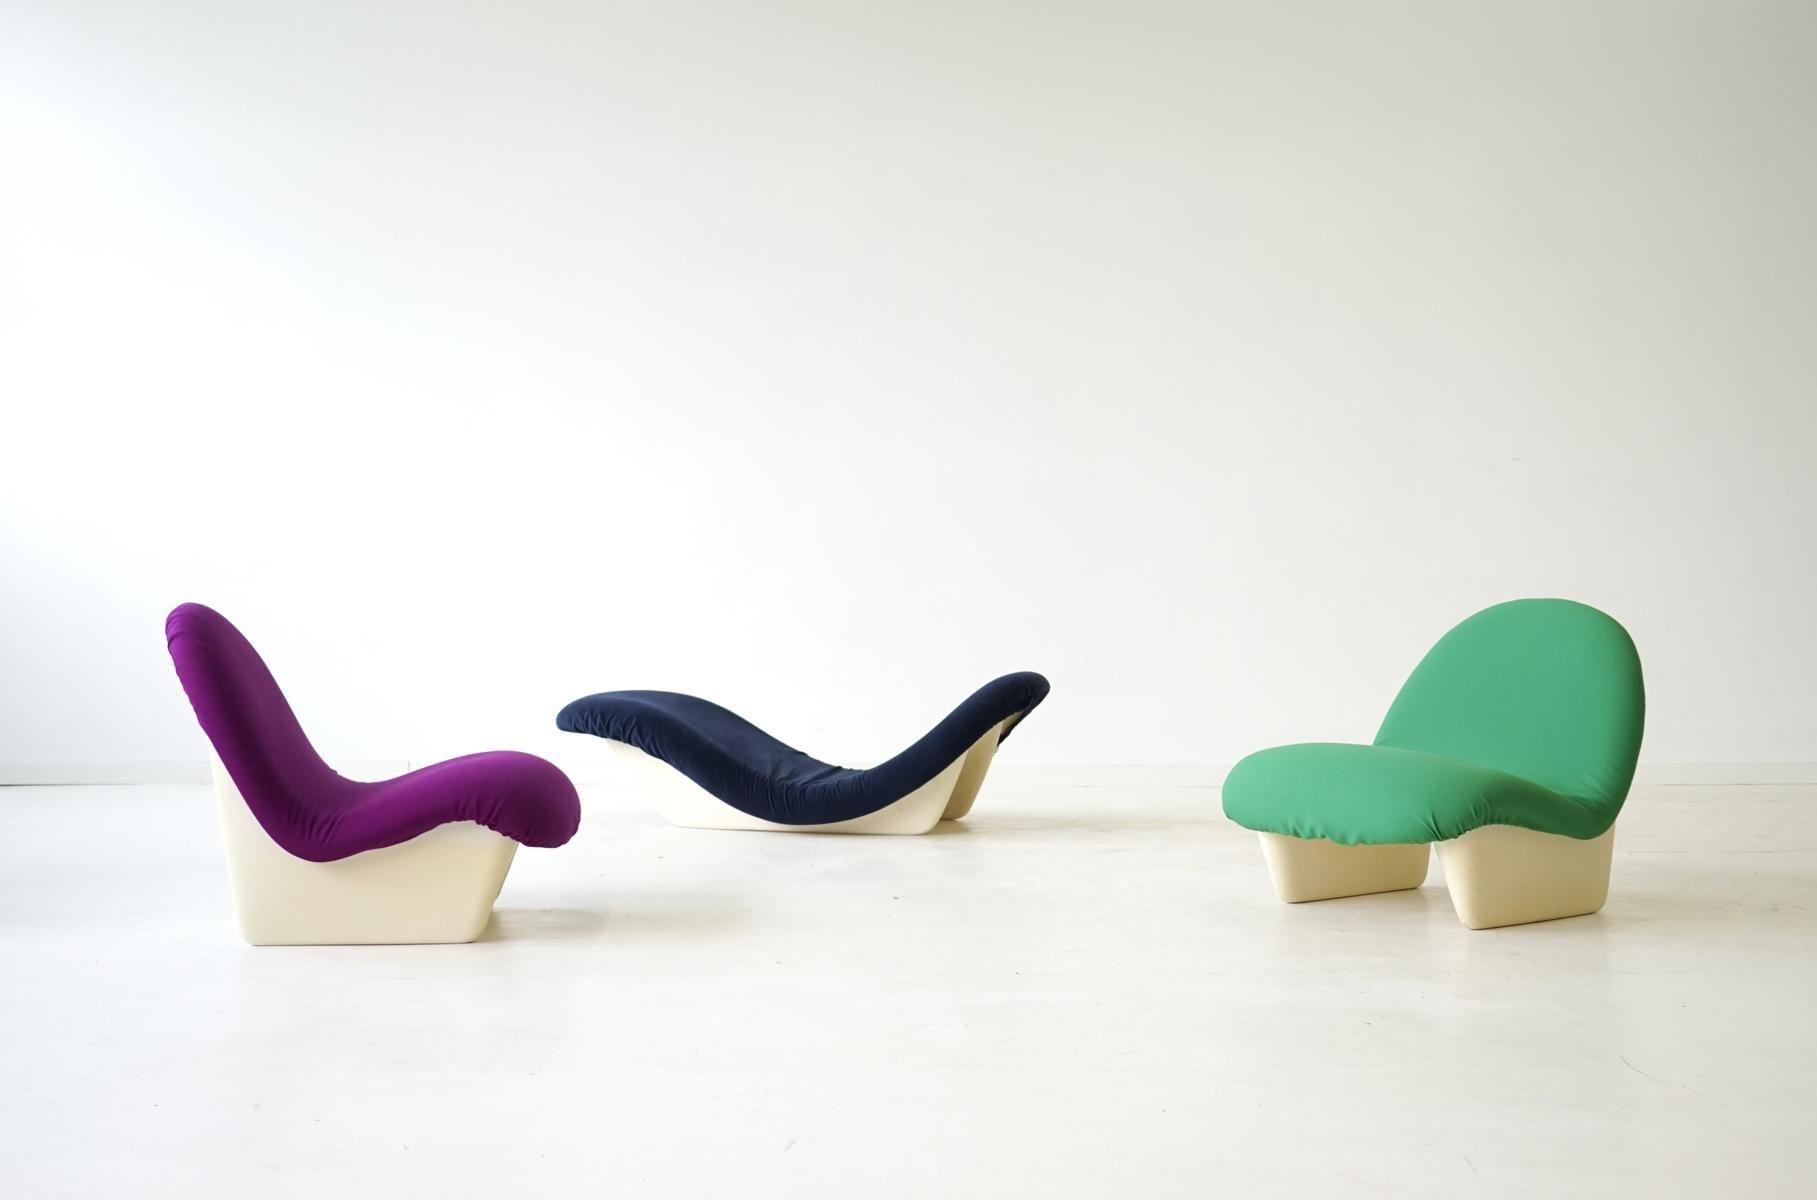 Luigi Colani Chair Luigi Colani 'sadima'BasfGermanyC1970Design Chair 'sadima'BasfGermanyC1970Design Luigi Colani xtsCQBohrd